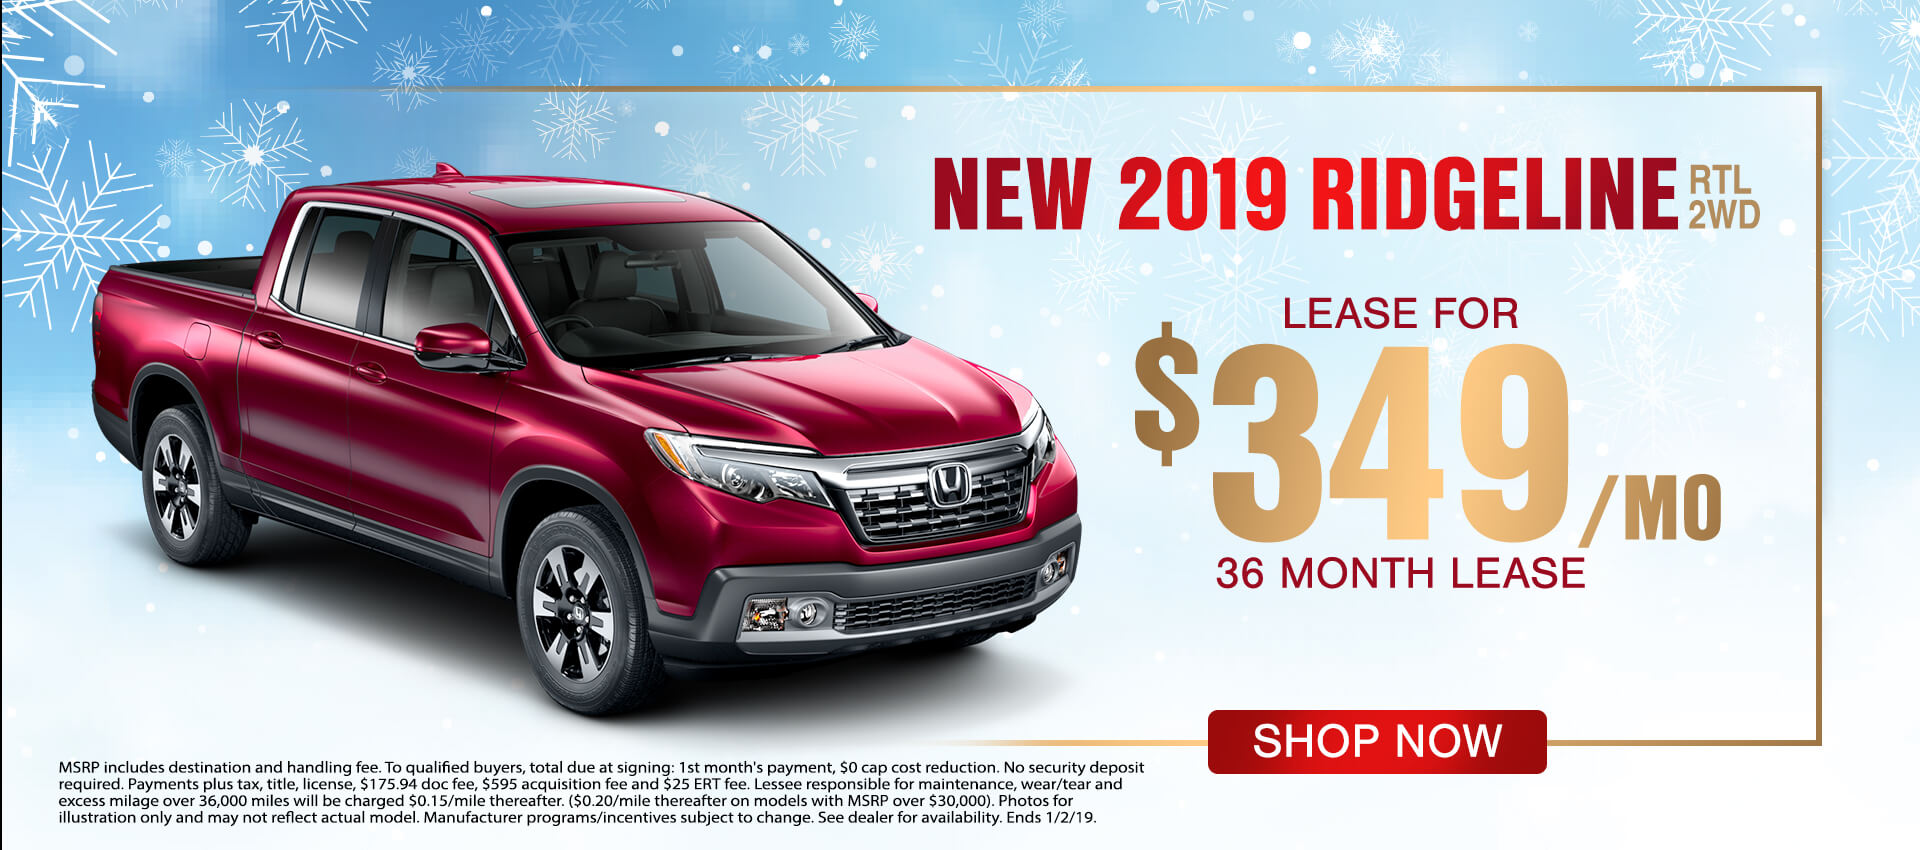 2019 Ridgeline $349 Lease